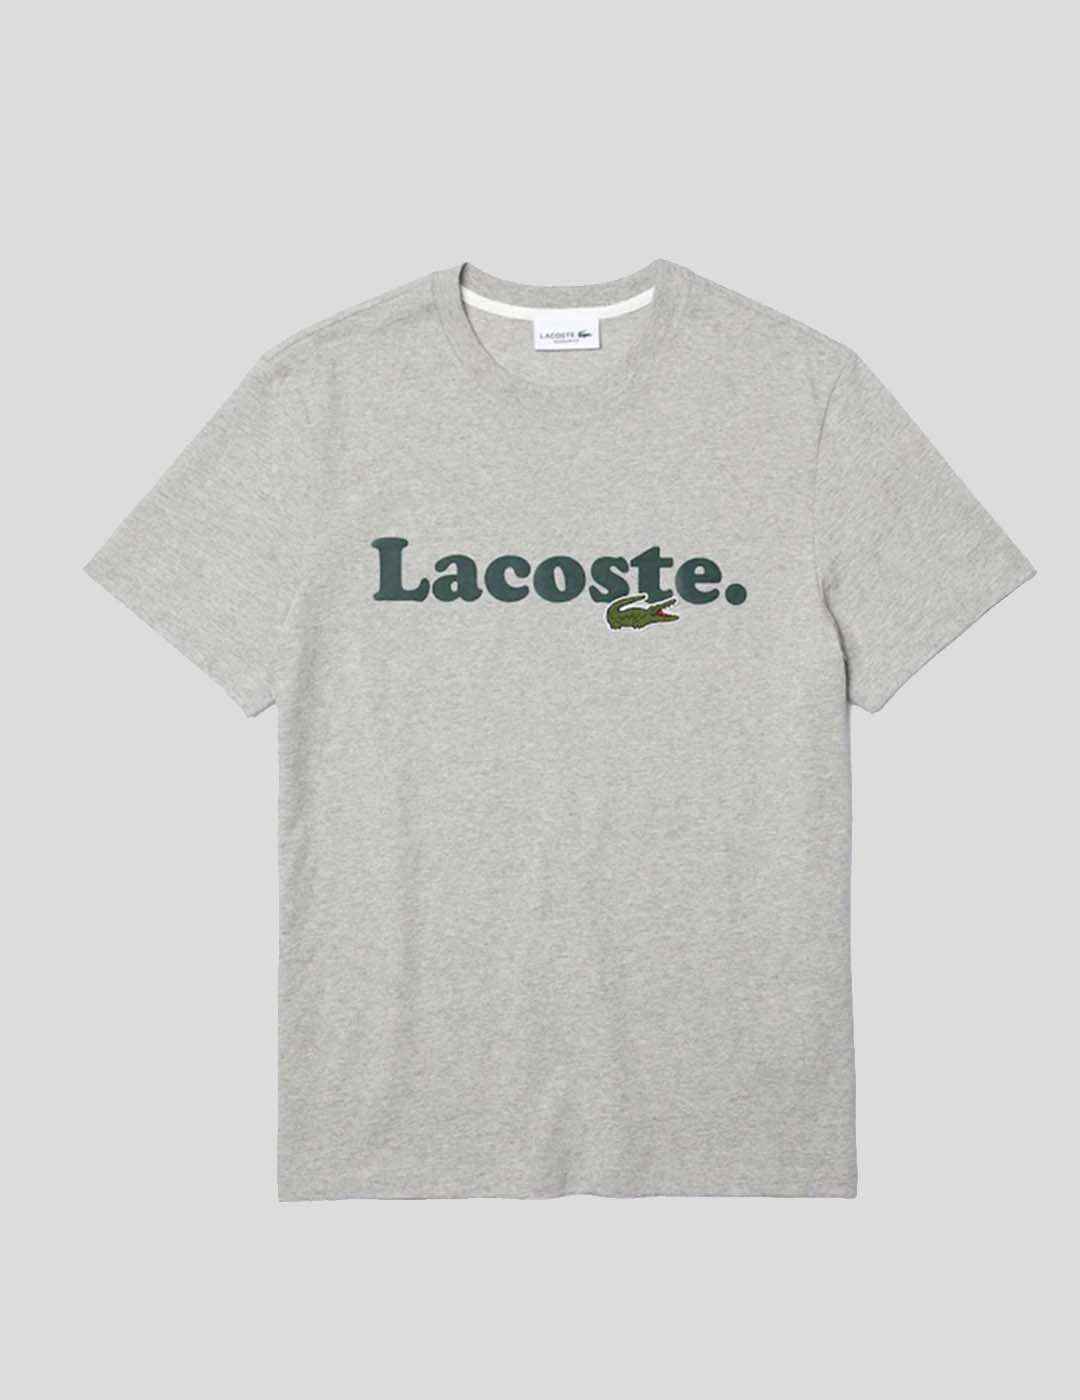 CAMISETA LACOSTE LOGO COCODRILO ARGENT CHINE